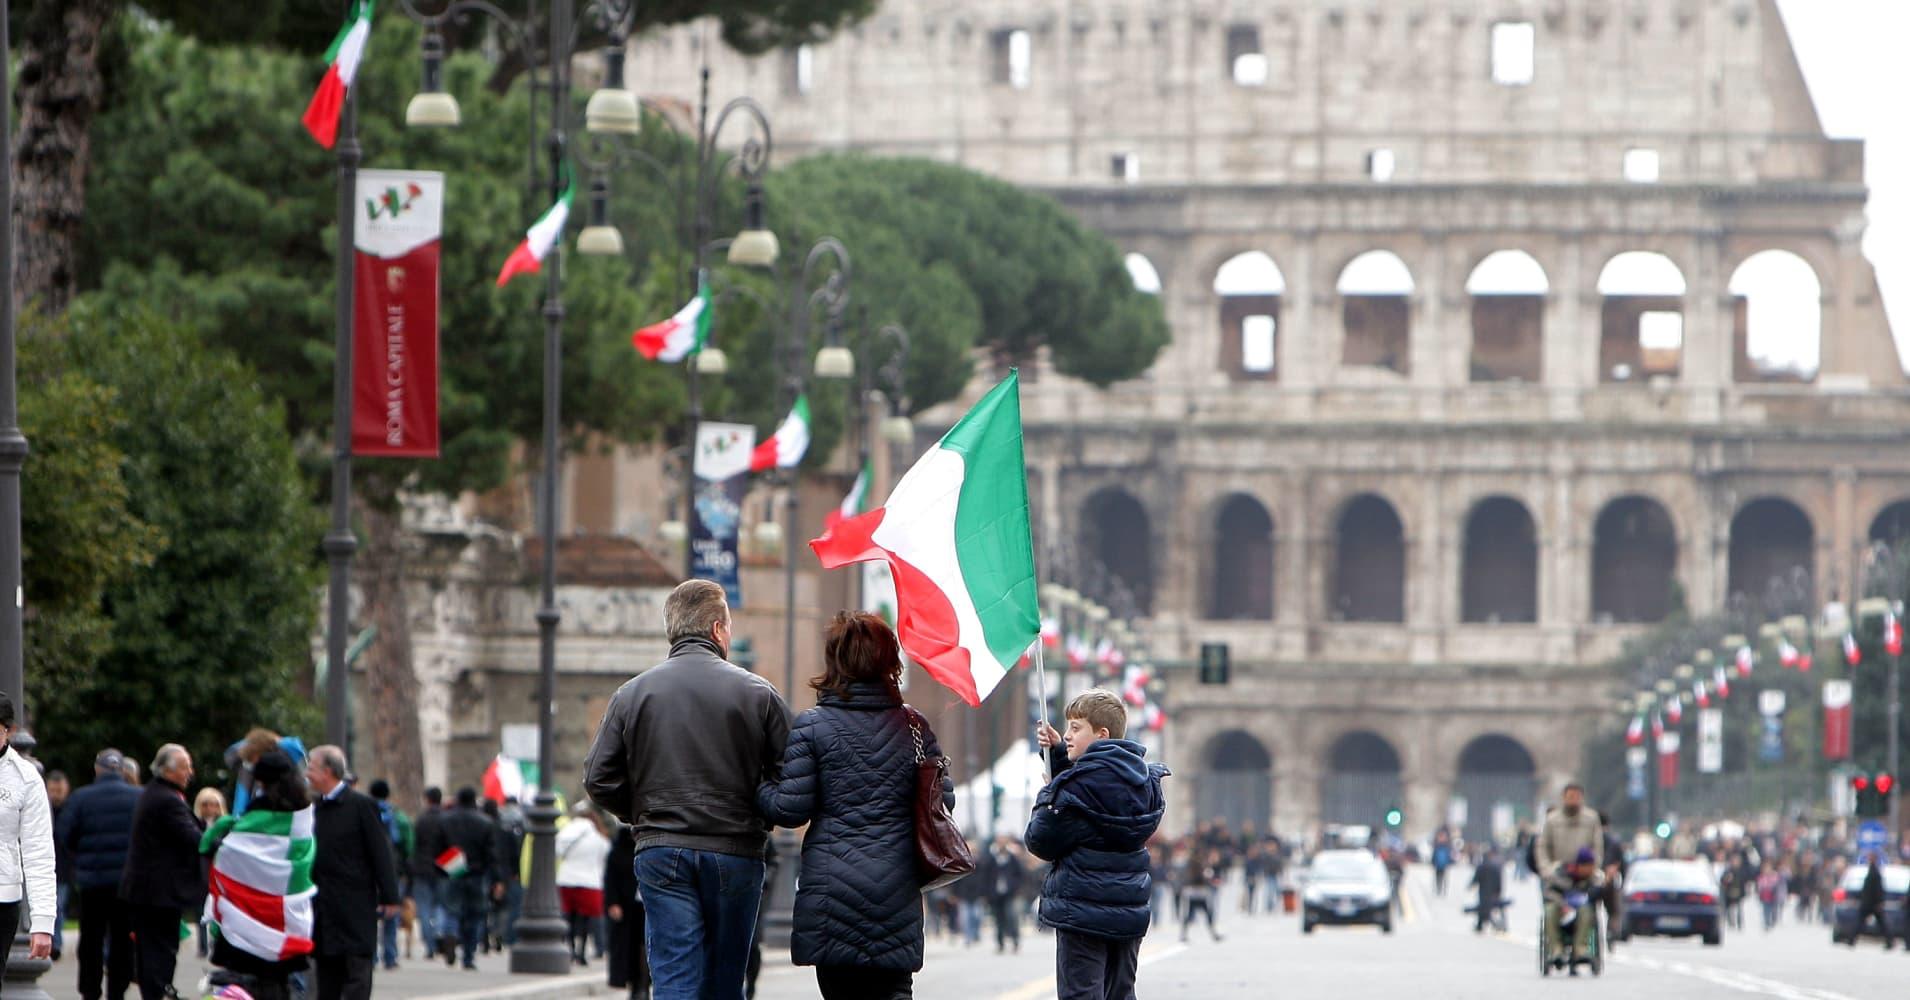 Italy's power struggle is threatening European democracy, union leader says